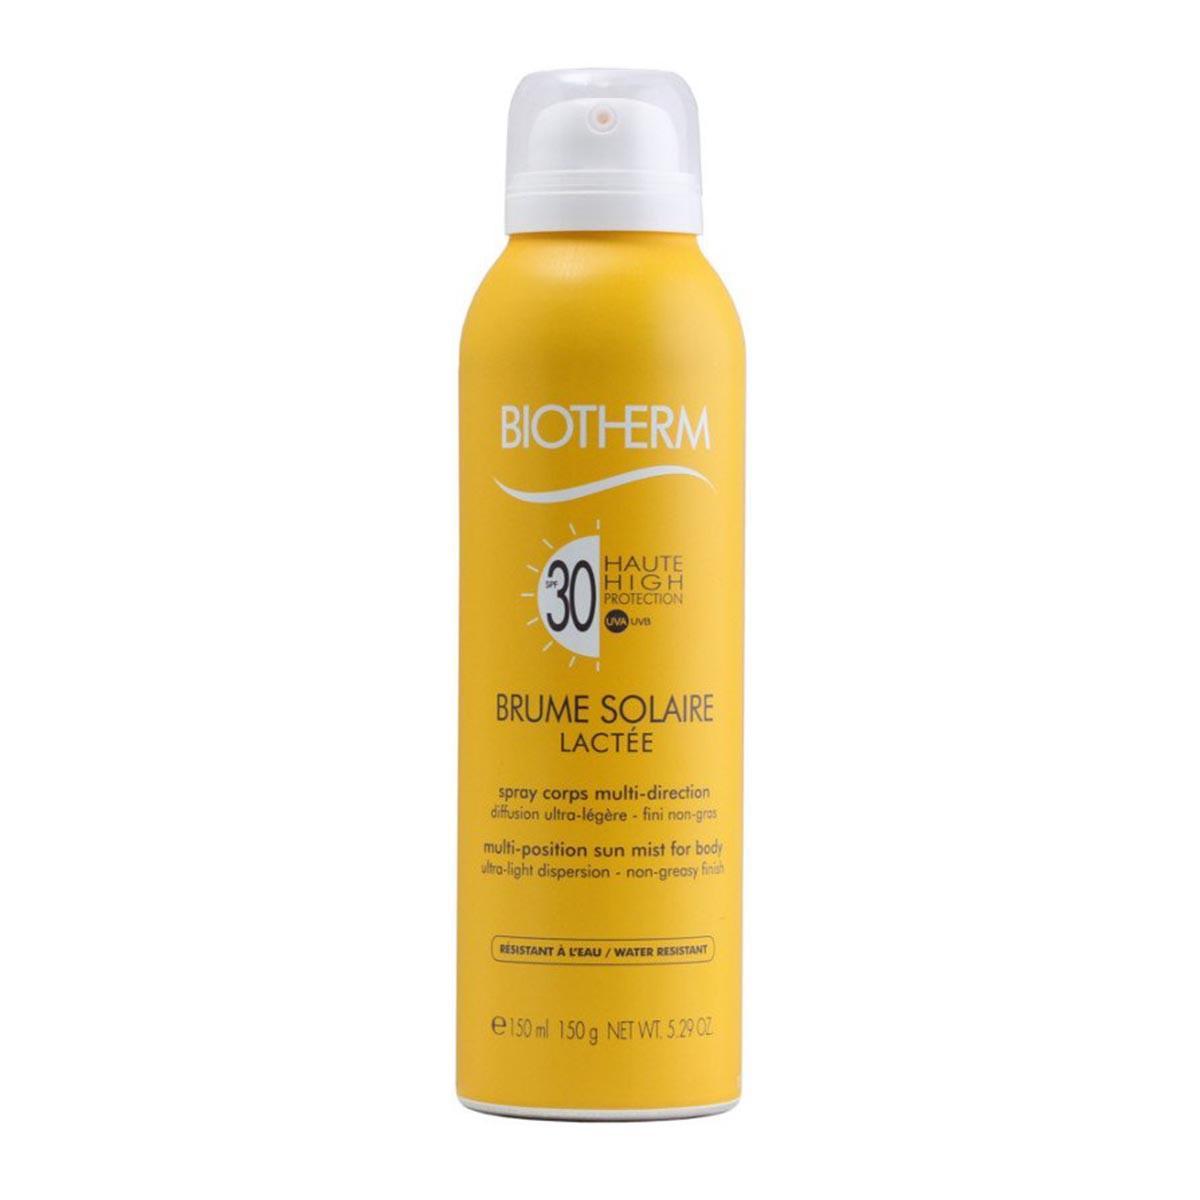 Biotherm-fragrances Brume Solaire Lactee Spf30 Sun Mist 150ml